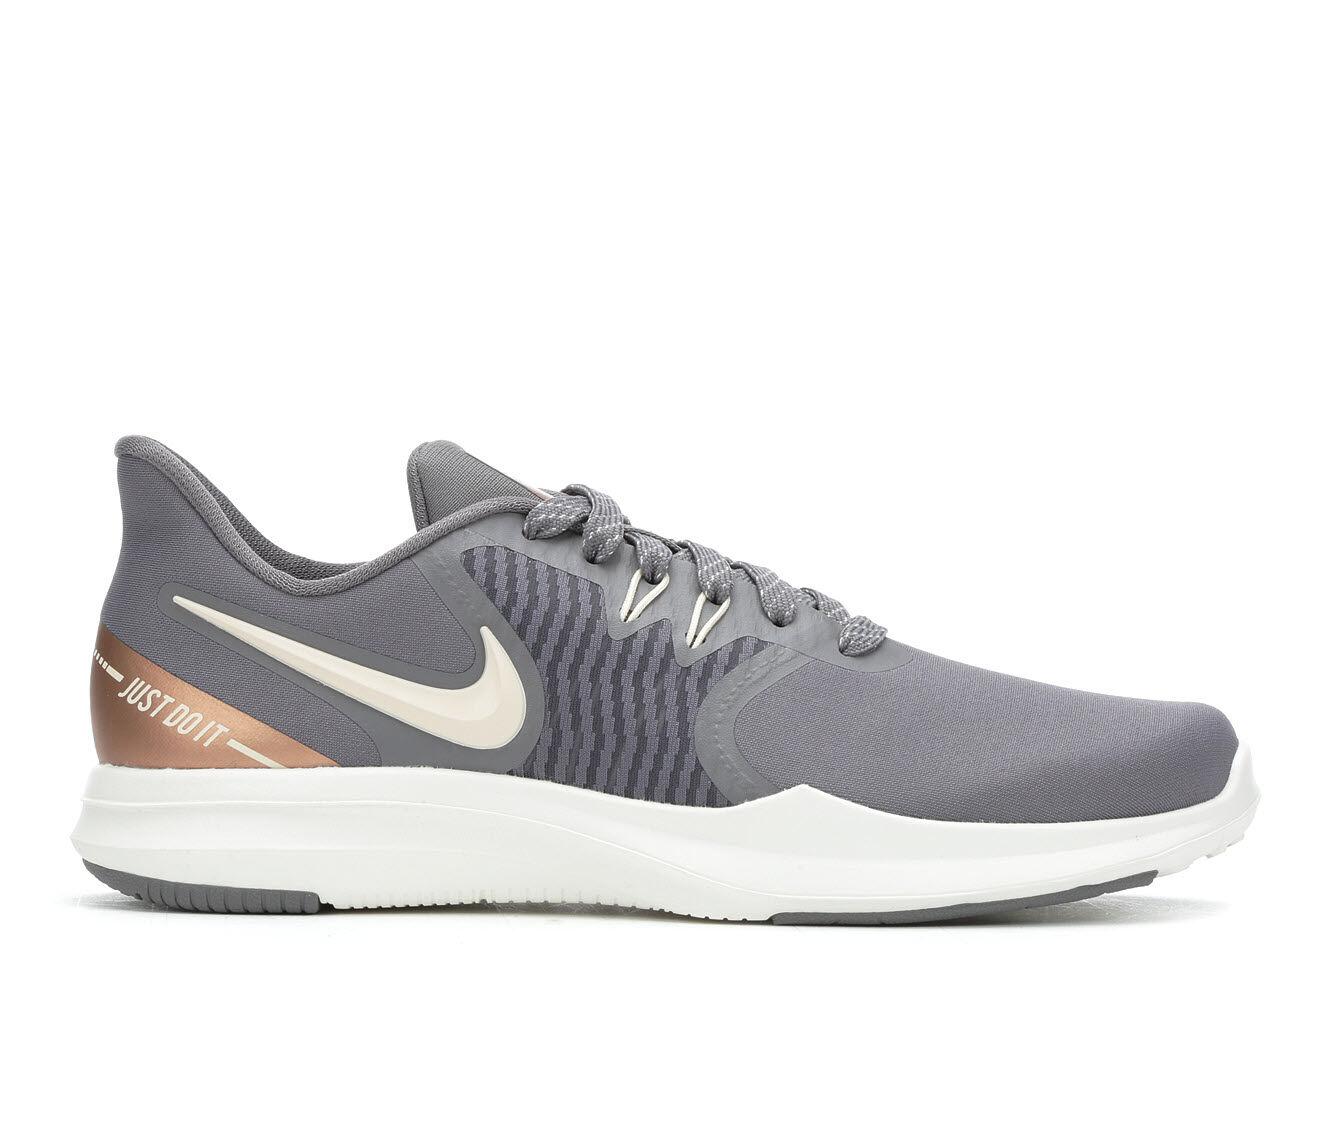 New Fashion Women's Nike In-Season TR 8 AMP Training Shoes Grey/Red Bronze